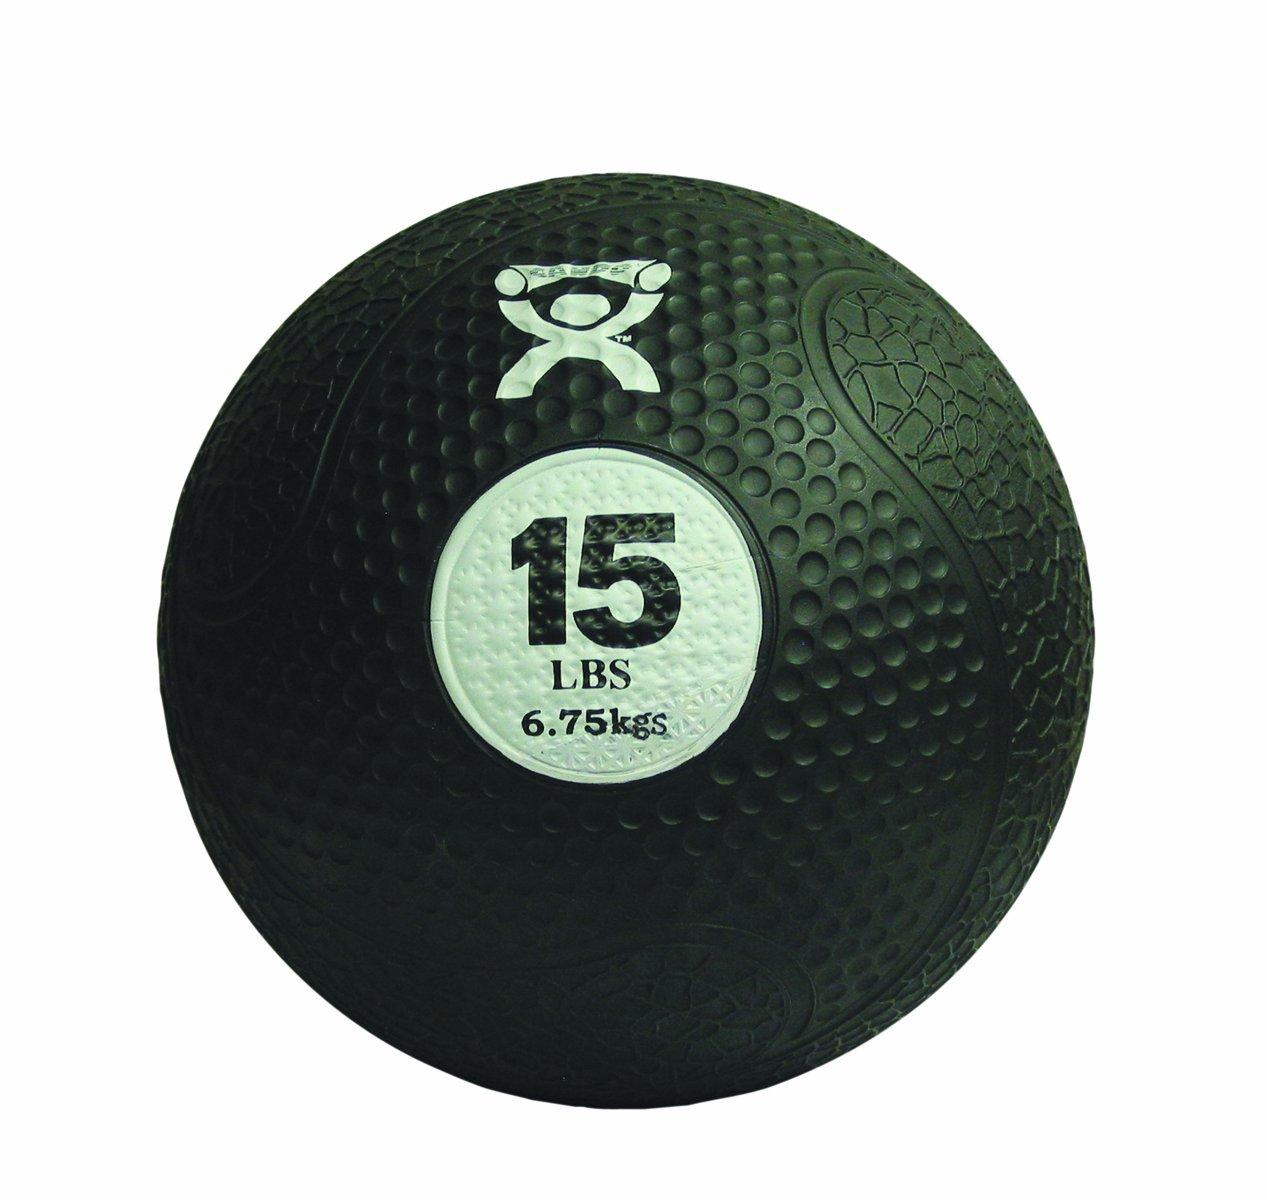 CanDo Rubber Medicine Balls, Black